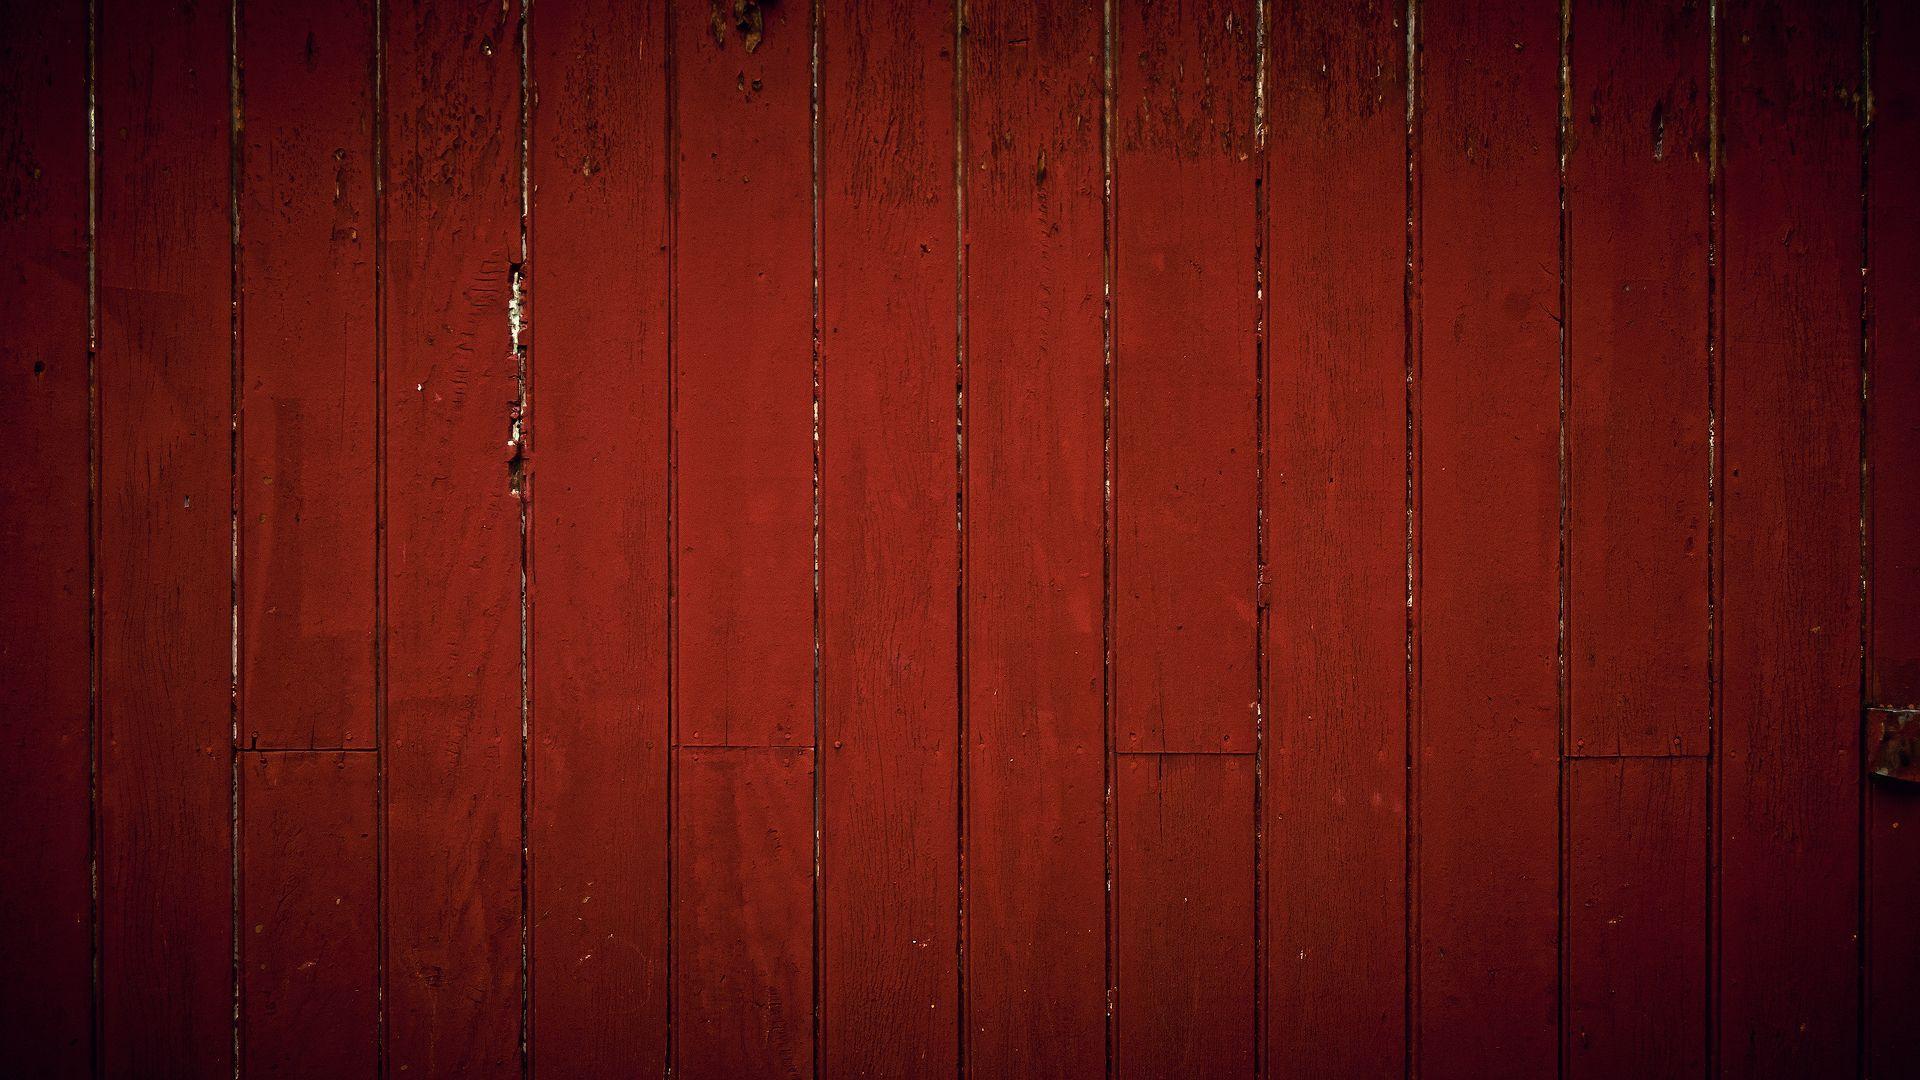 47 Plank Board Wallpaper On Wallpapersafari